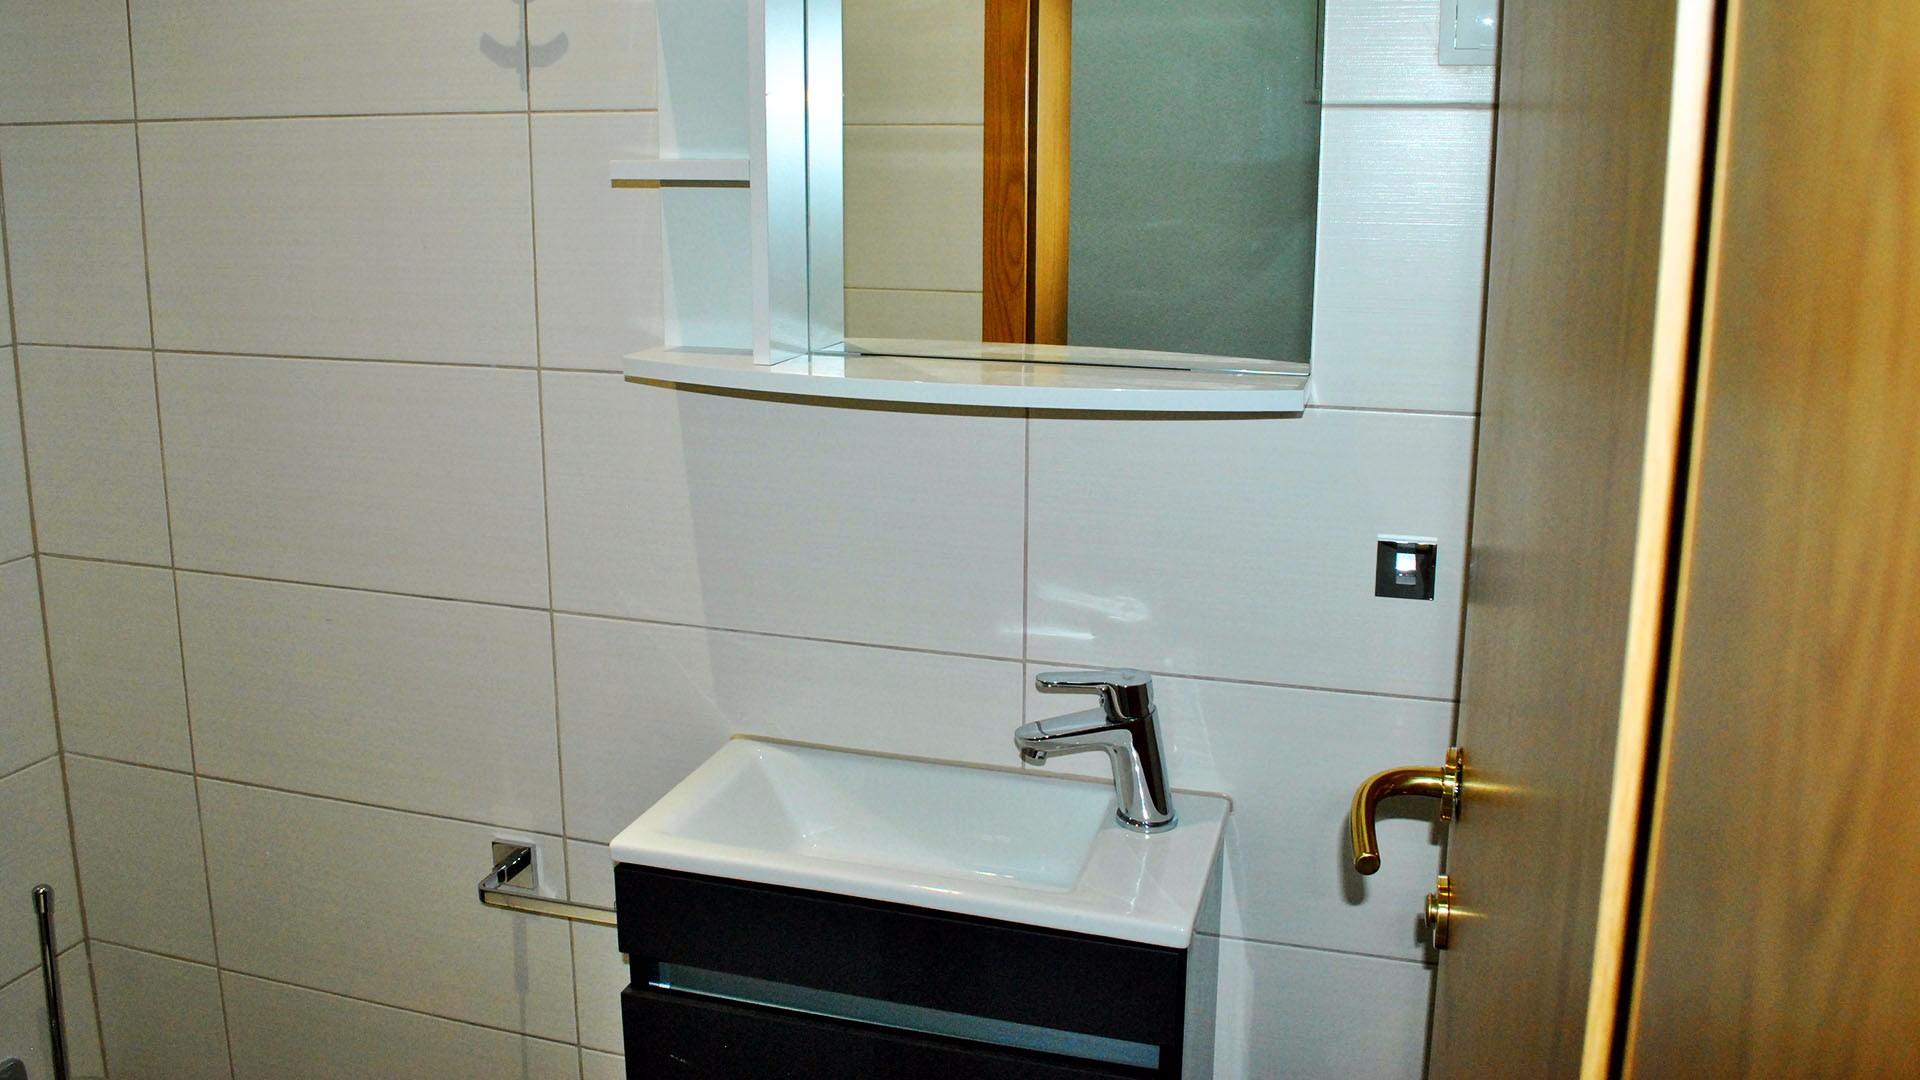 ApartmentA7 bathroom